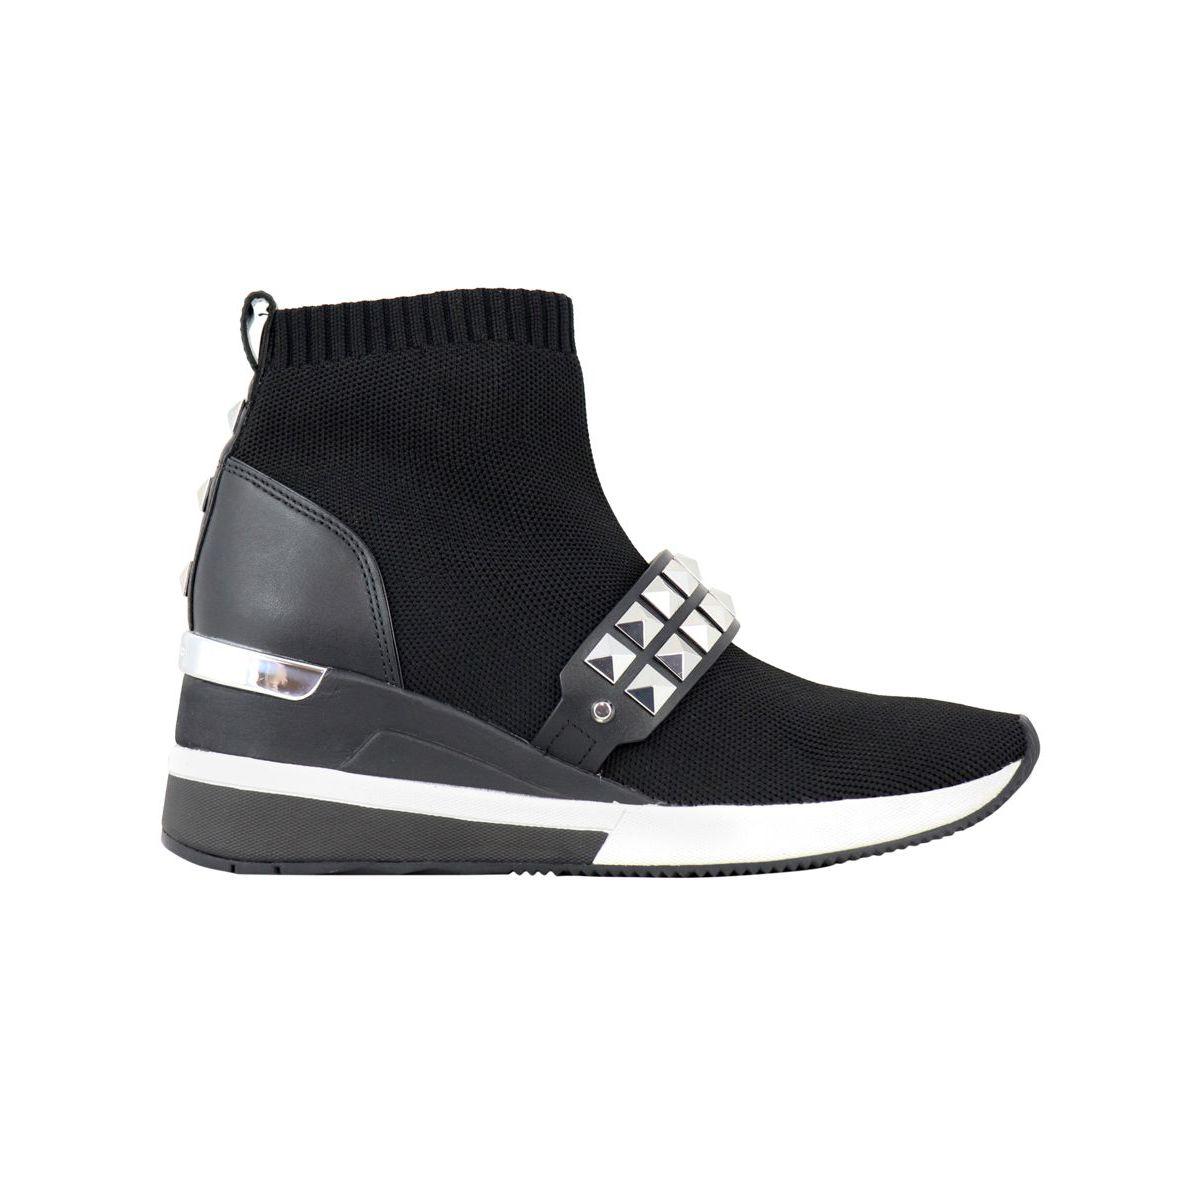 Skyler Bootie high-top sneakers Black Michael Kors